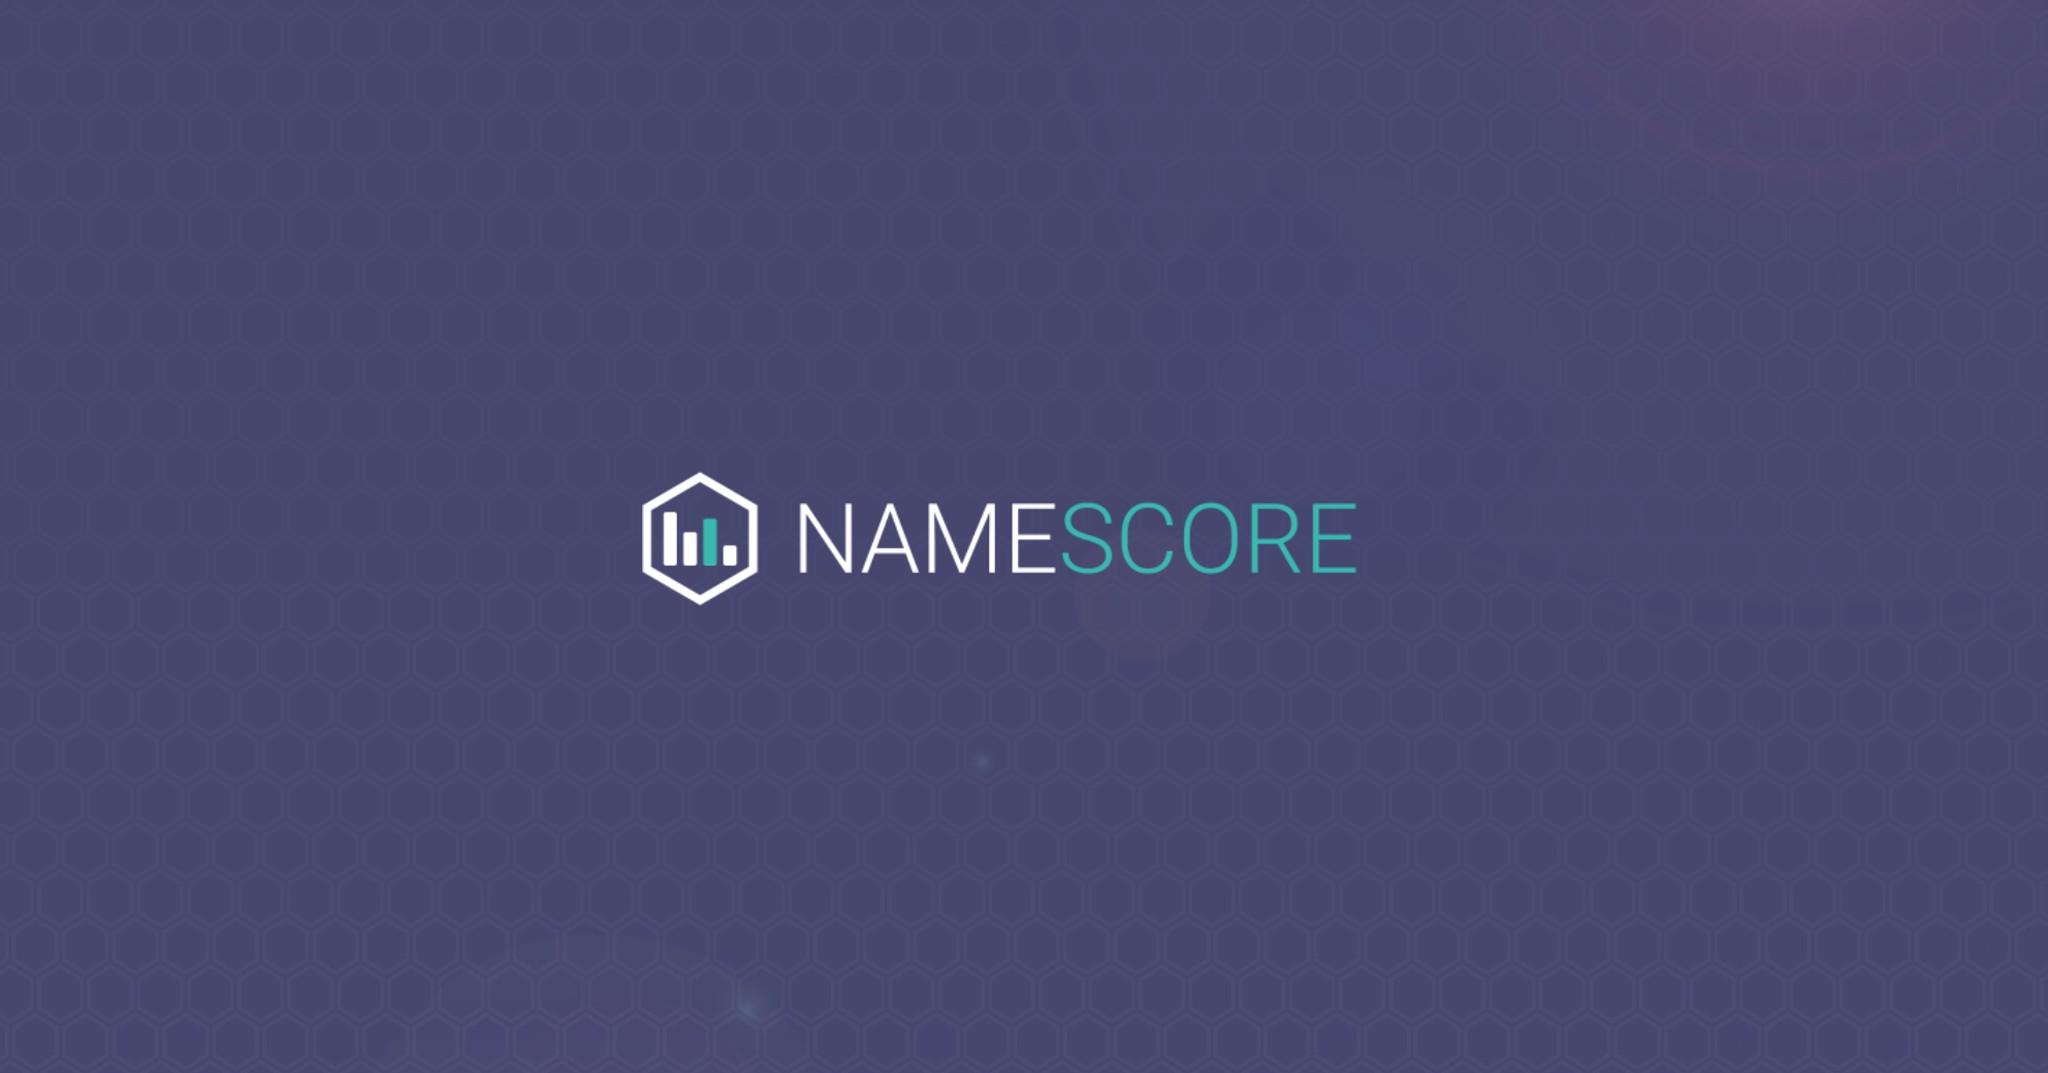 NameScore